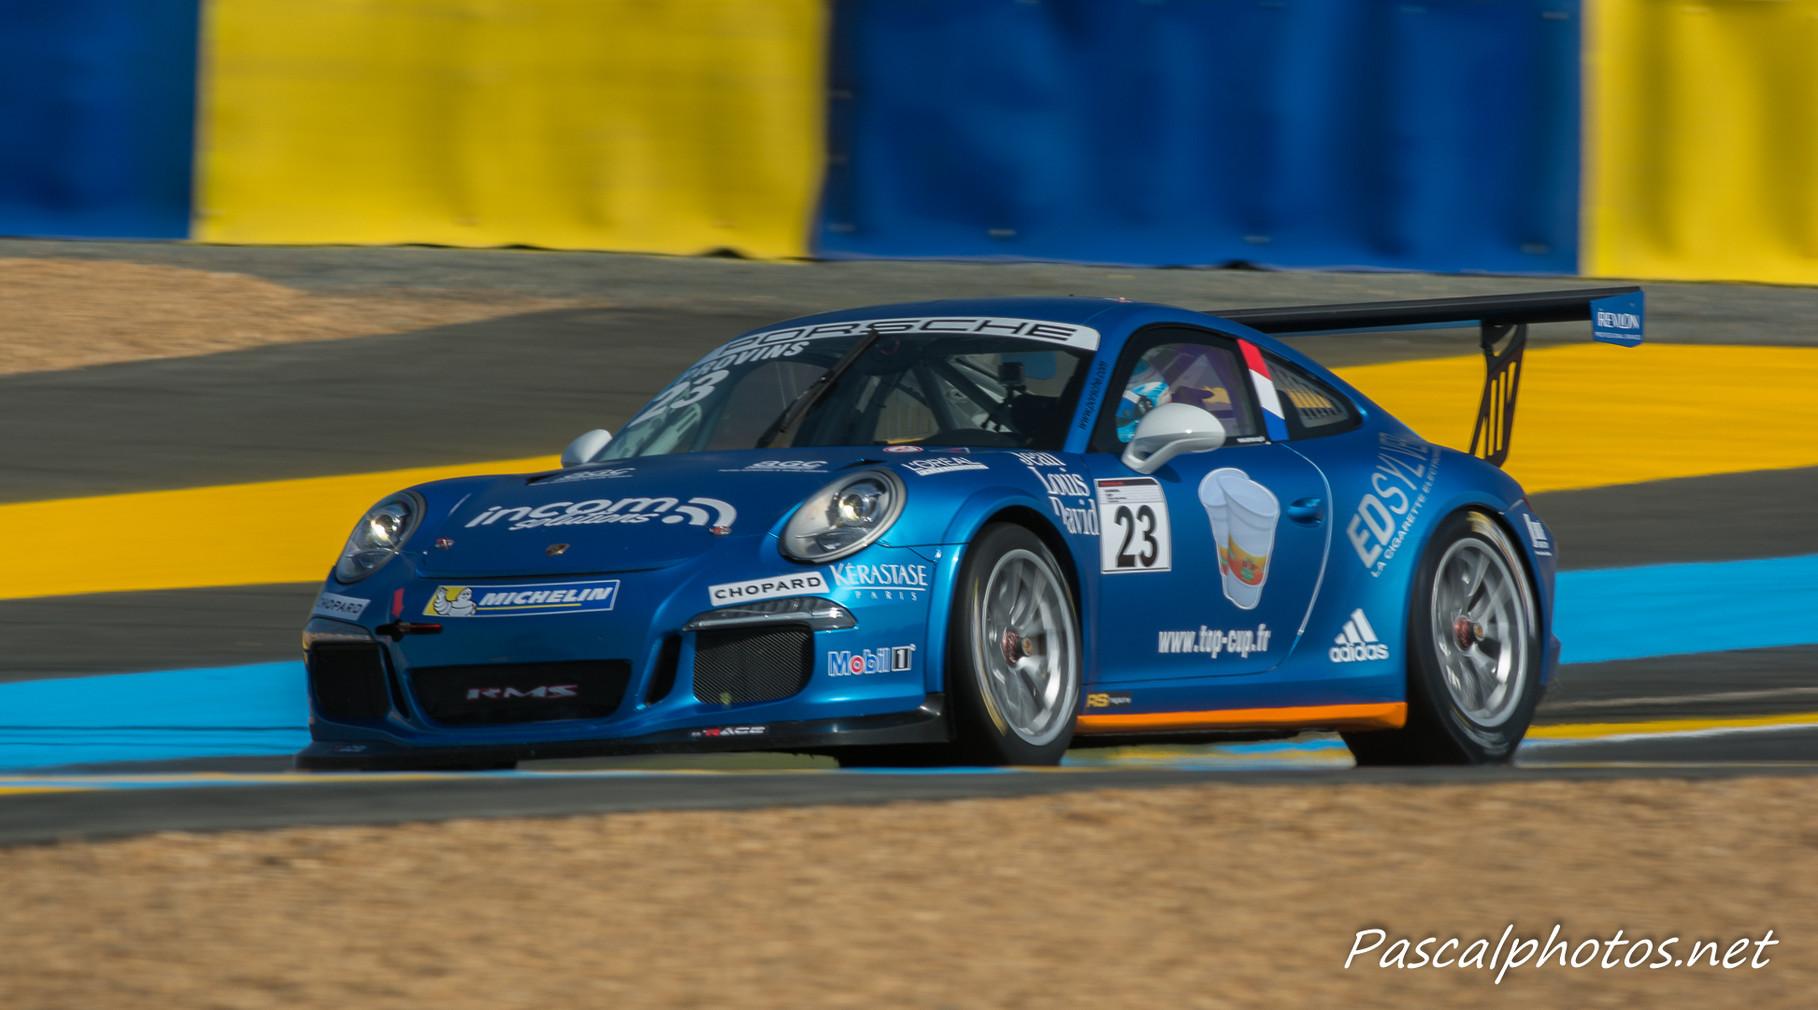 Porsche Carrera Cup , 24 heures du mans 2014